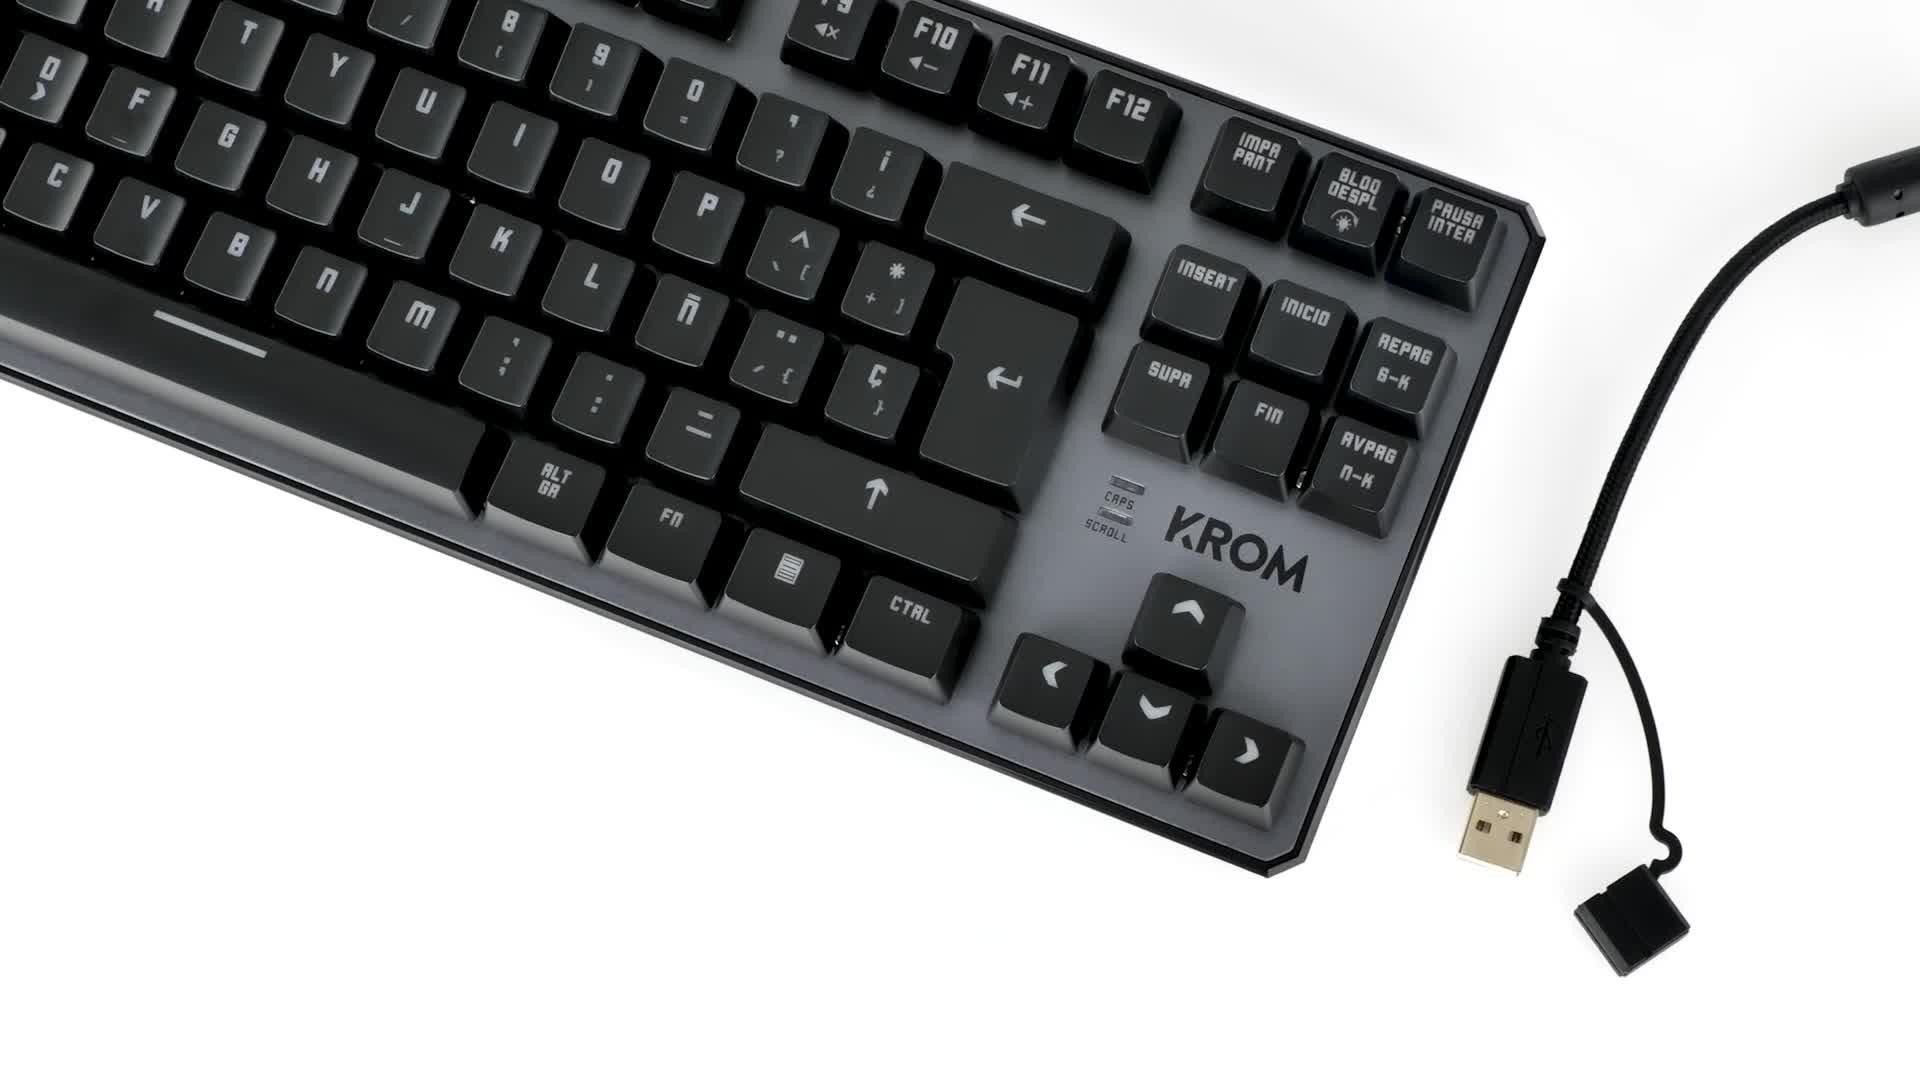 Krom Teclado Gaming Kernel TKL -NXKROMKRNLTKL - Teclado Mecanico, sin Teclado numerico, iluminacion LED RGB, silencioso, Layout Español